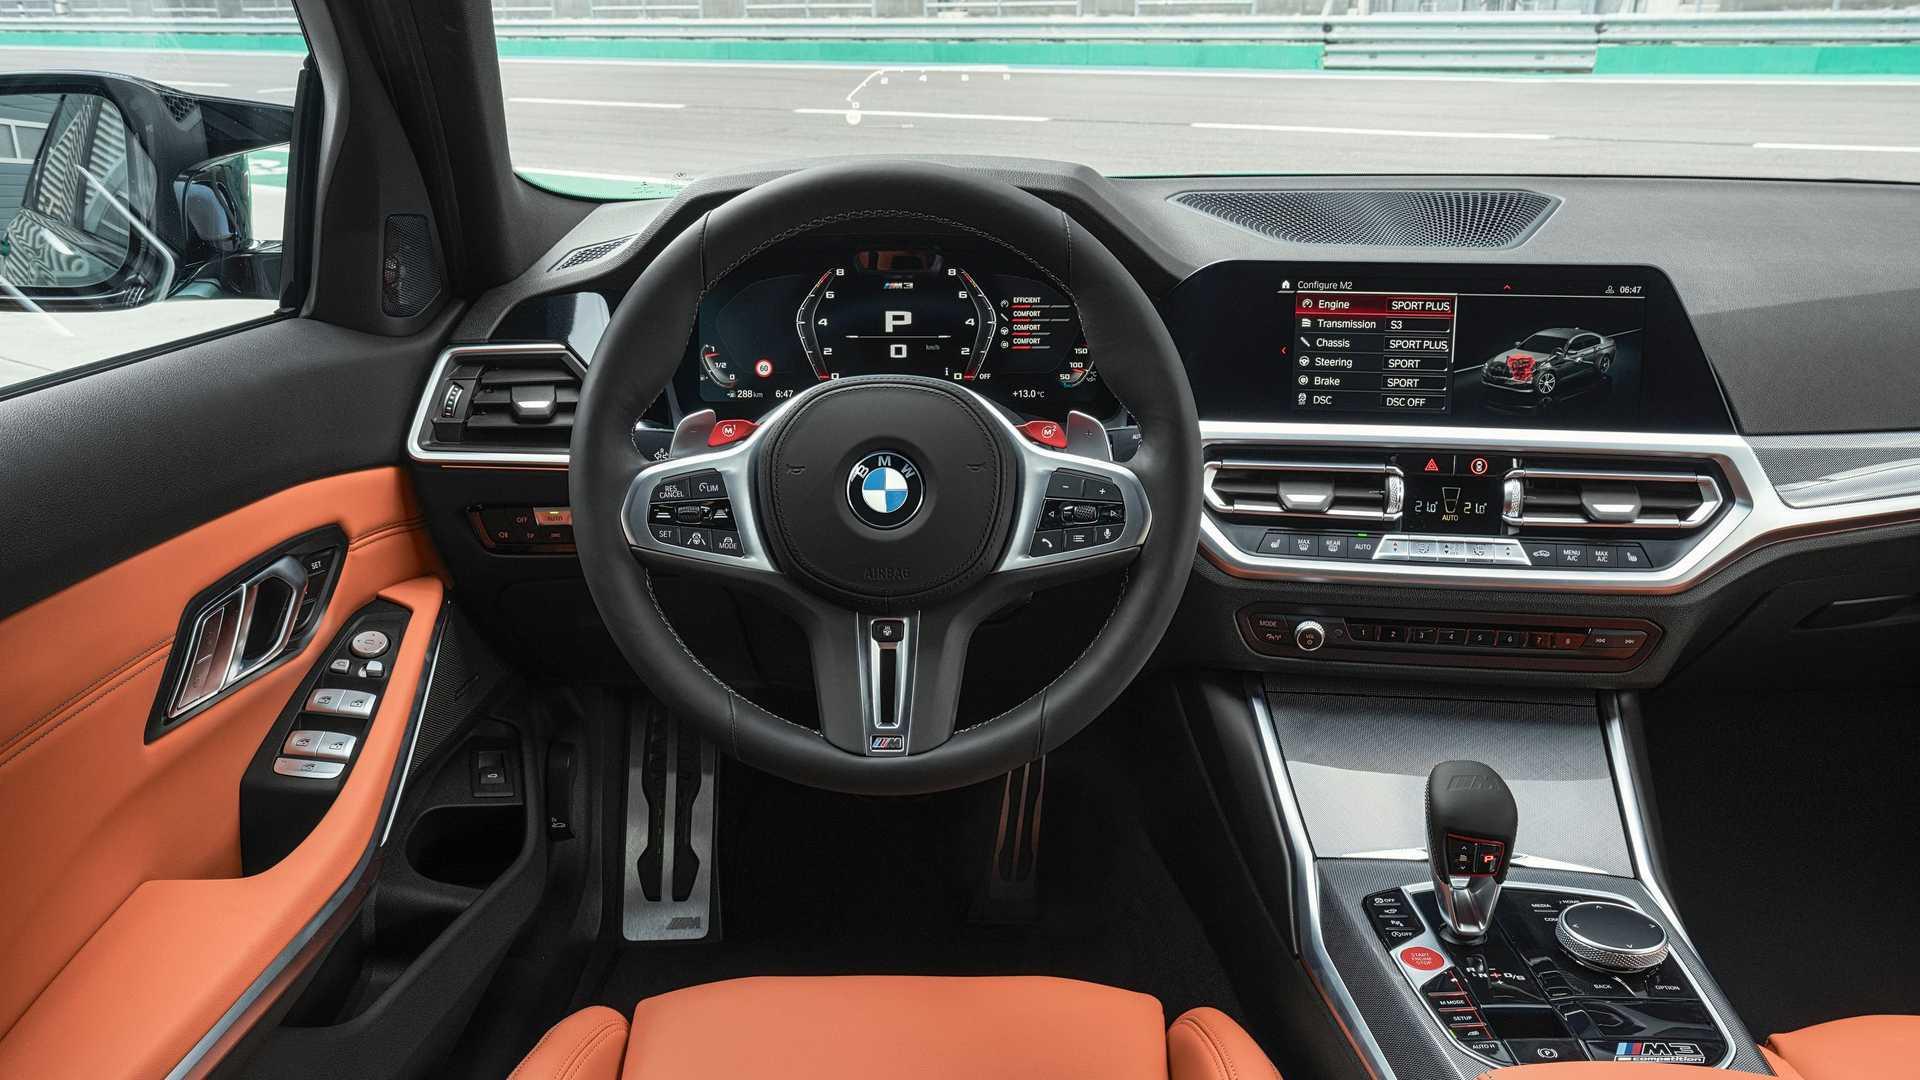 2021-bmw-m3-interior